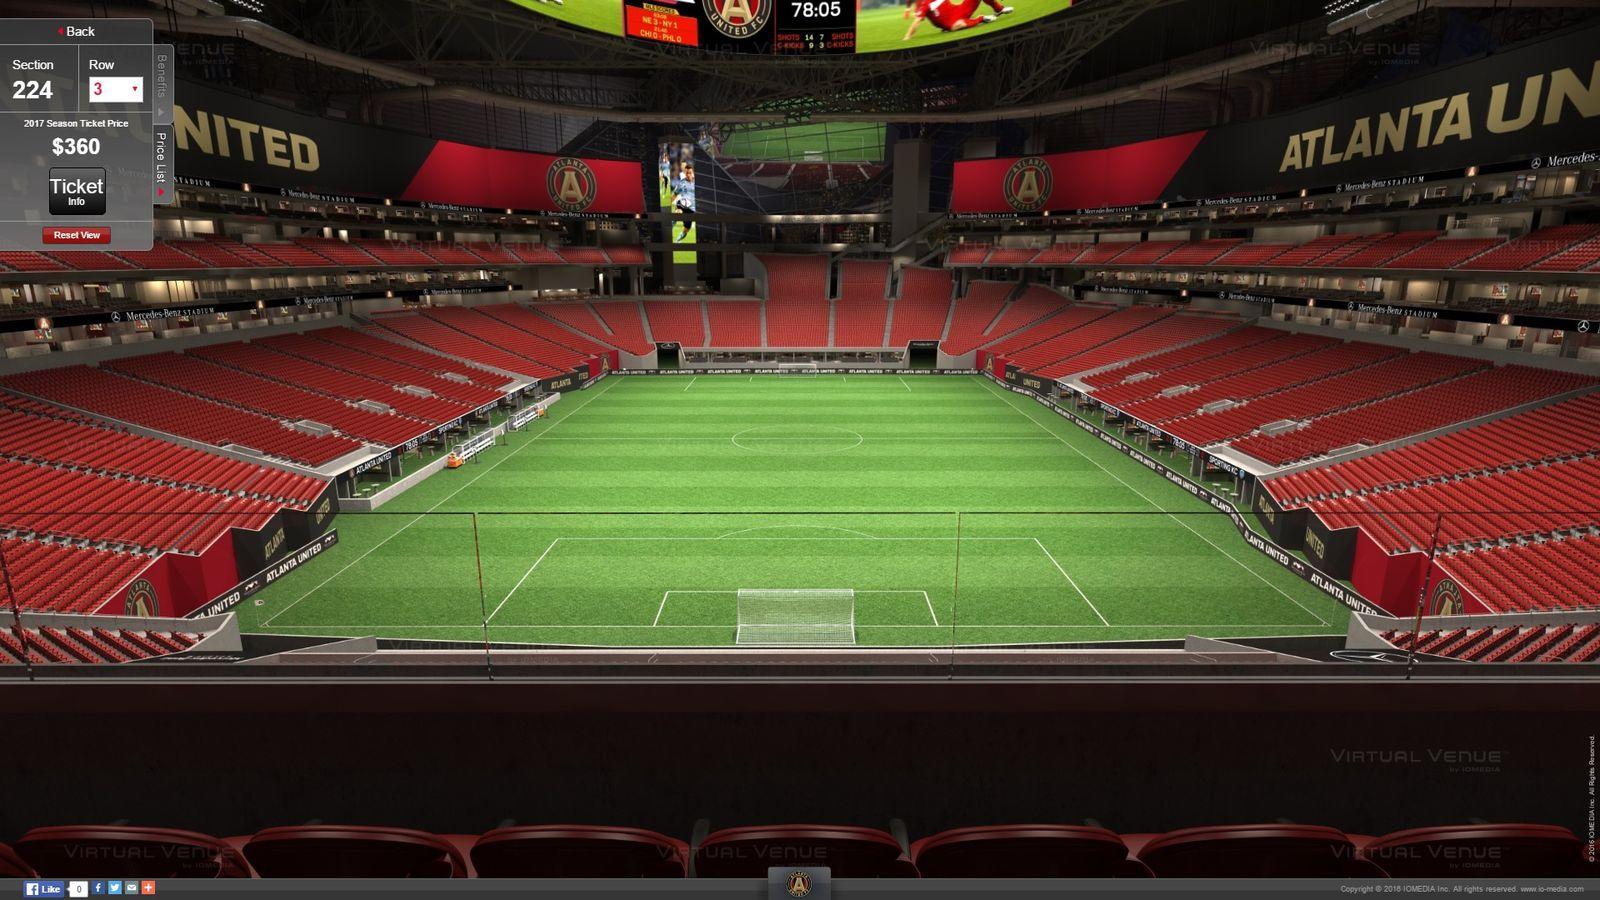 Atlanta United S Virtual Venue Seating For Mercedes Benz